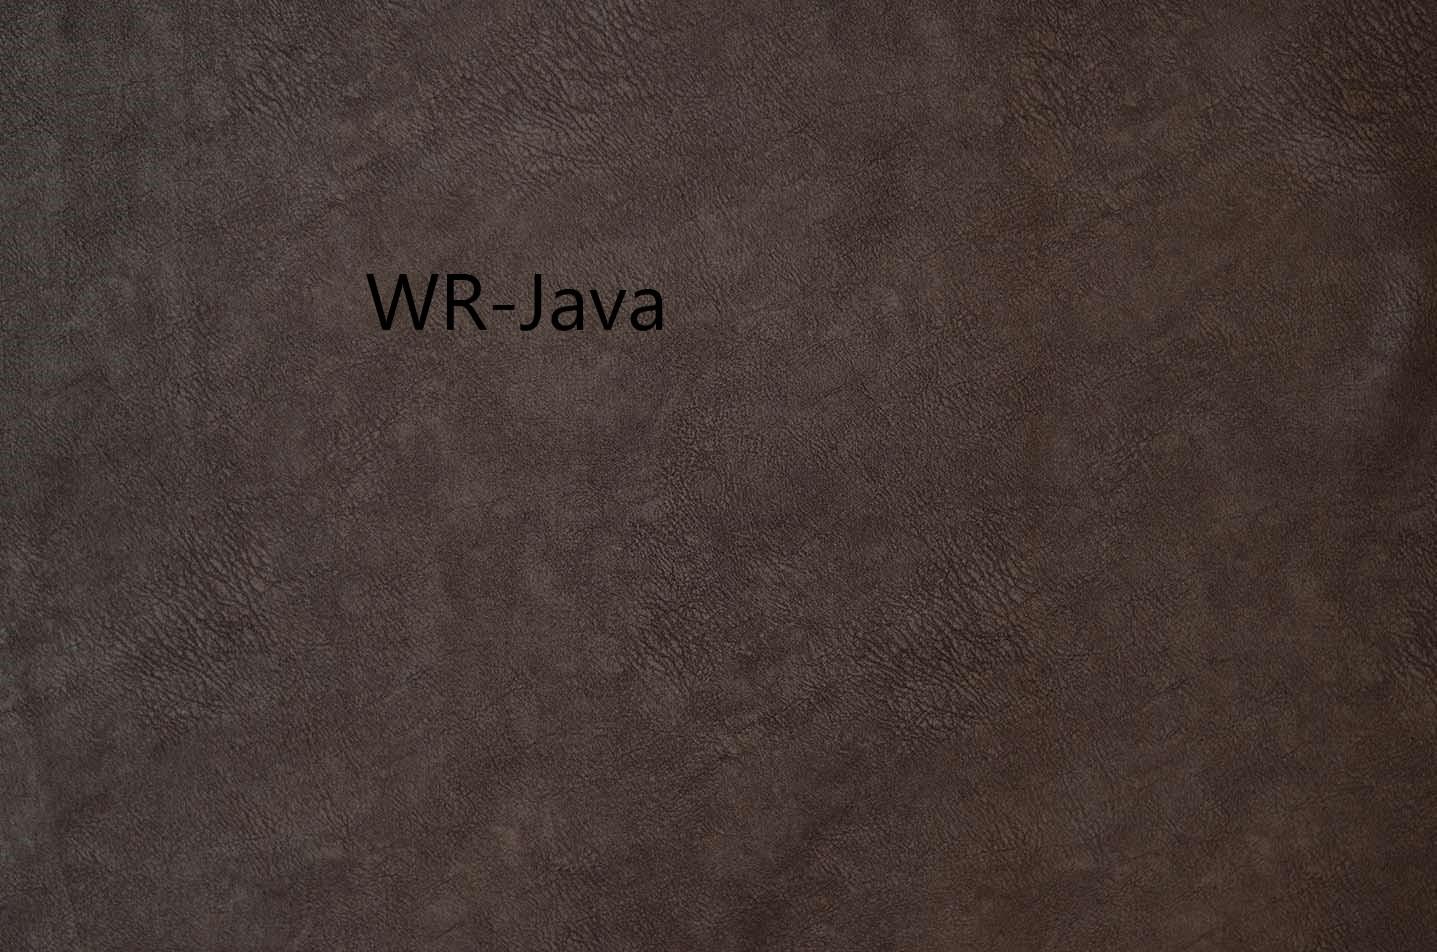 WR-Java